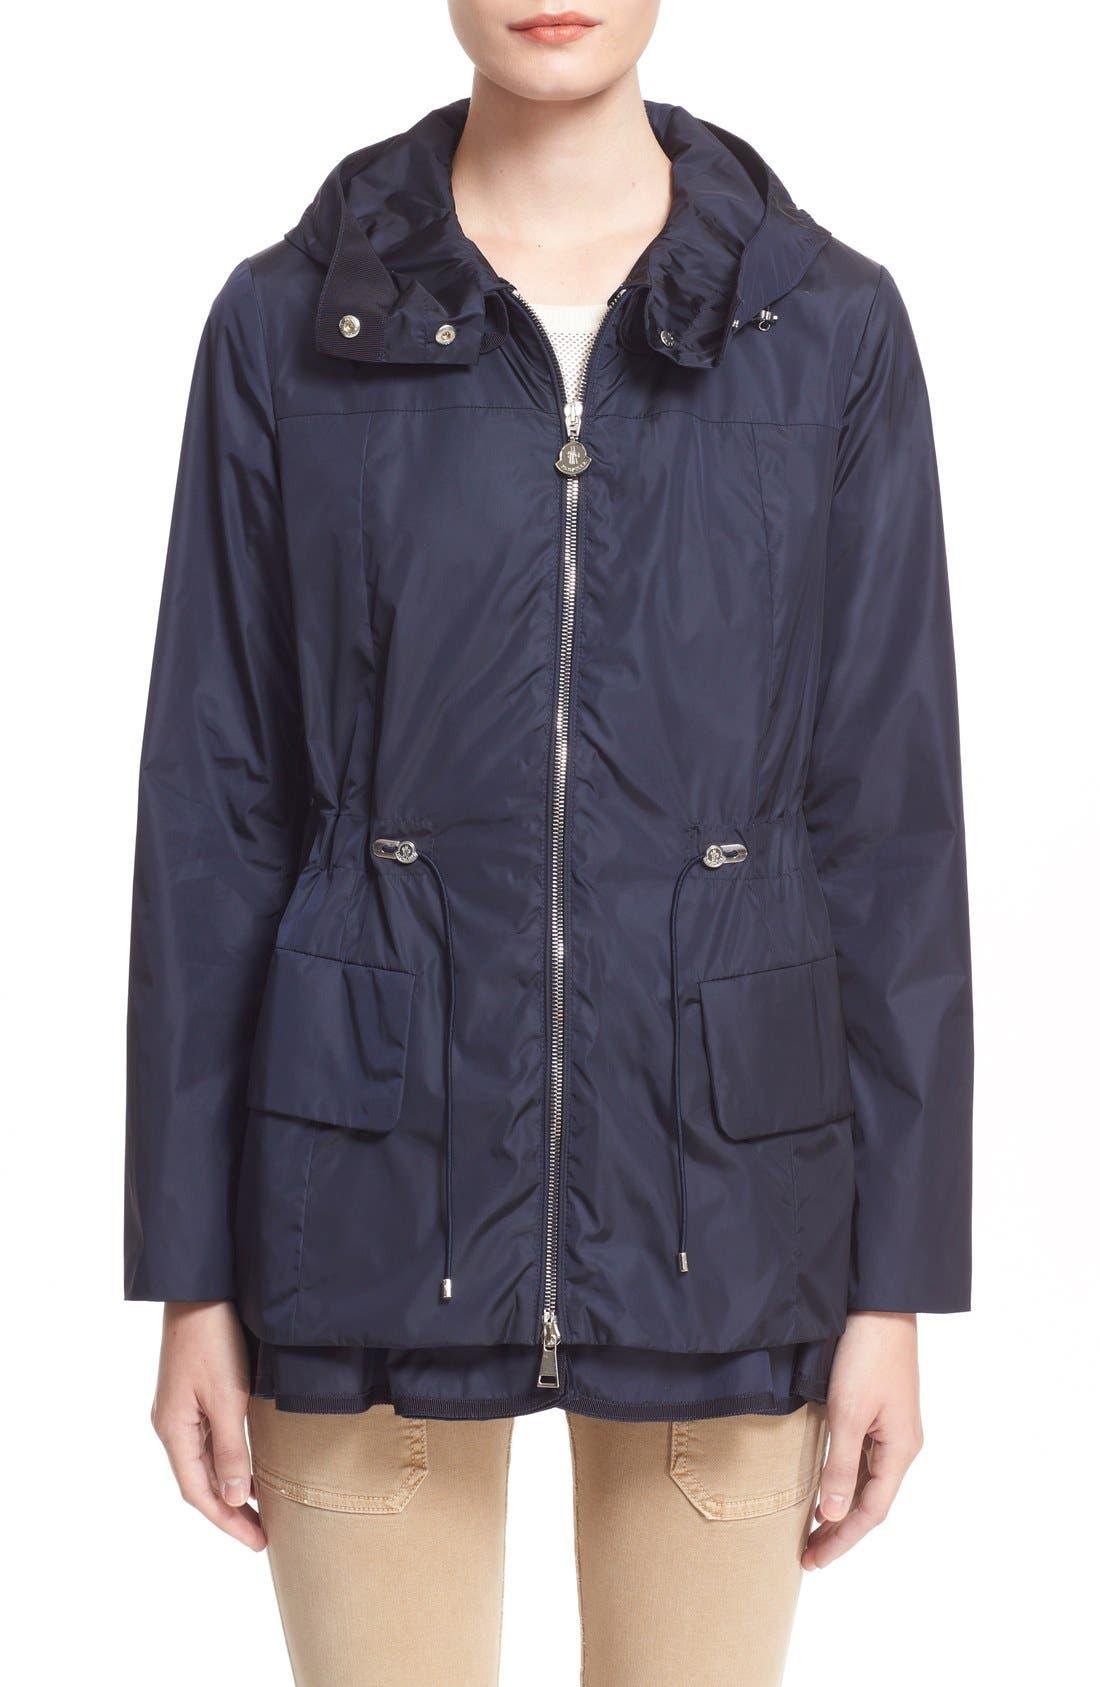 Alternate Image 1 Selected - Moncler 'Limbert' Water Resistant Peplum Hem Hooded Rain Jacket